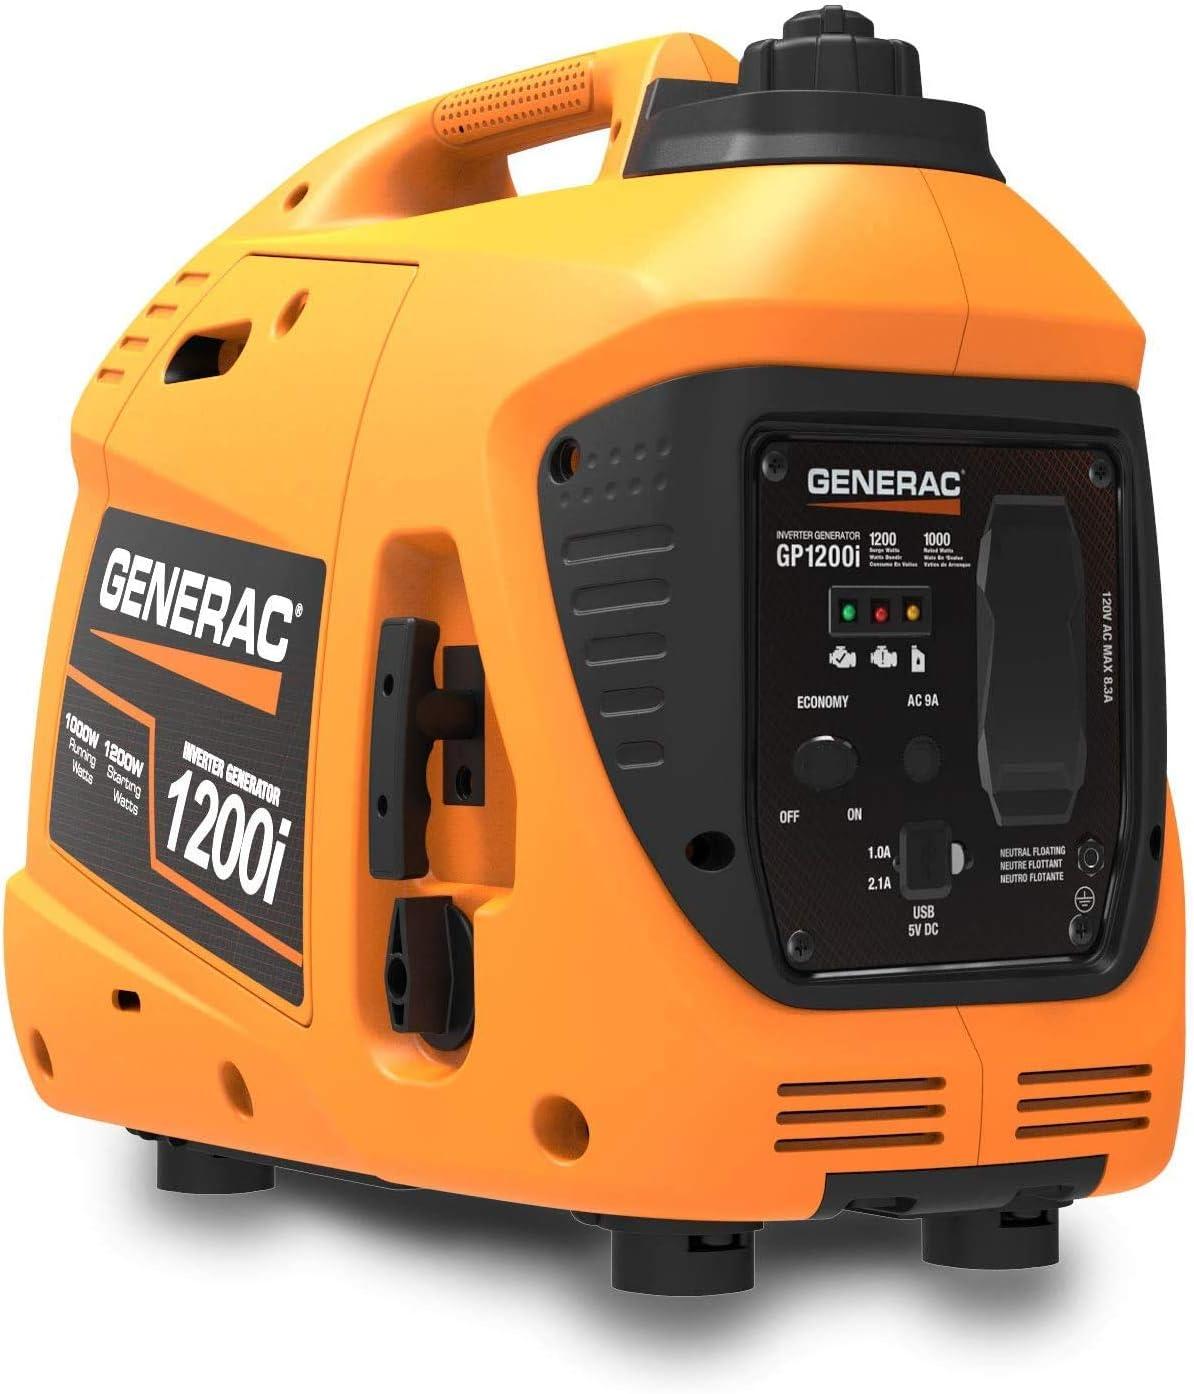 Generac 1200-Watt Portable Inverter Generator